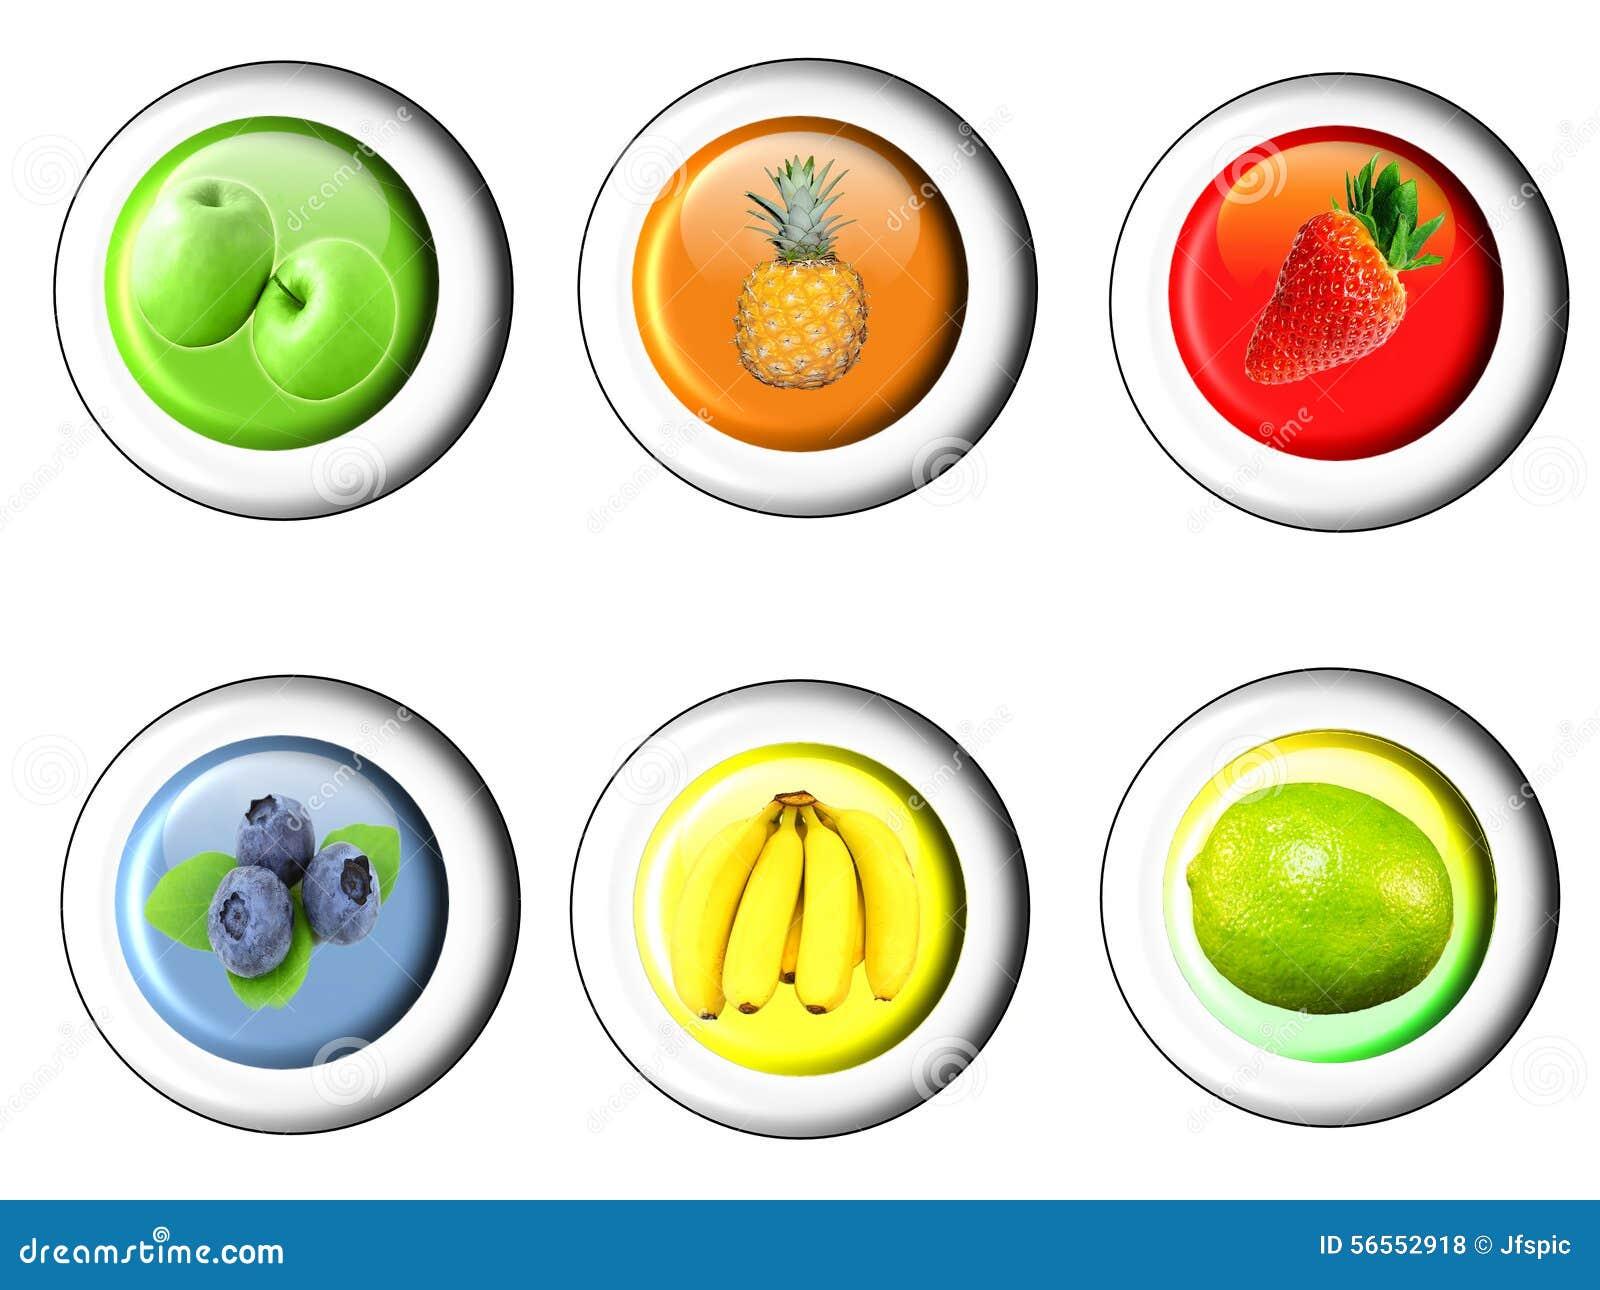 Download Κουμπί που τίθεται με το εικονίδιο φρούτων Απεικόνιση αποθεμάτων - εικονογραφία από εξωτικός, λεμόνι: 56552918